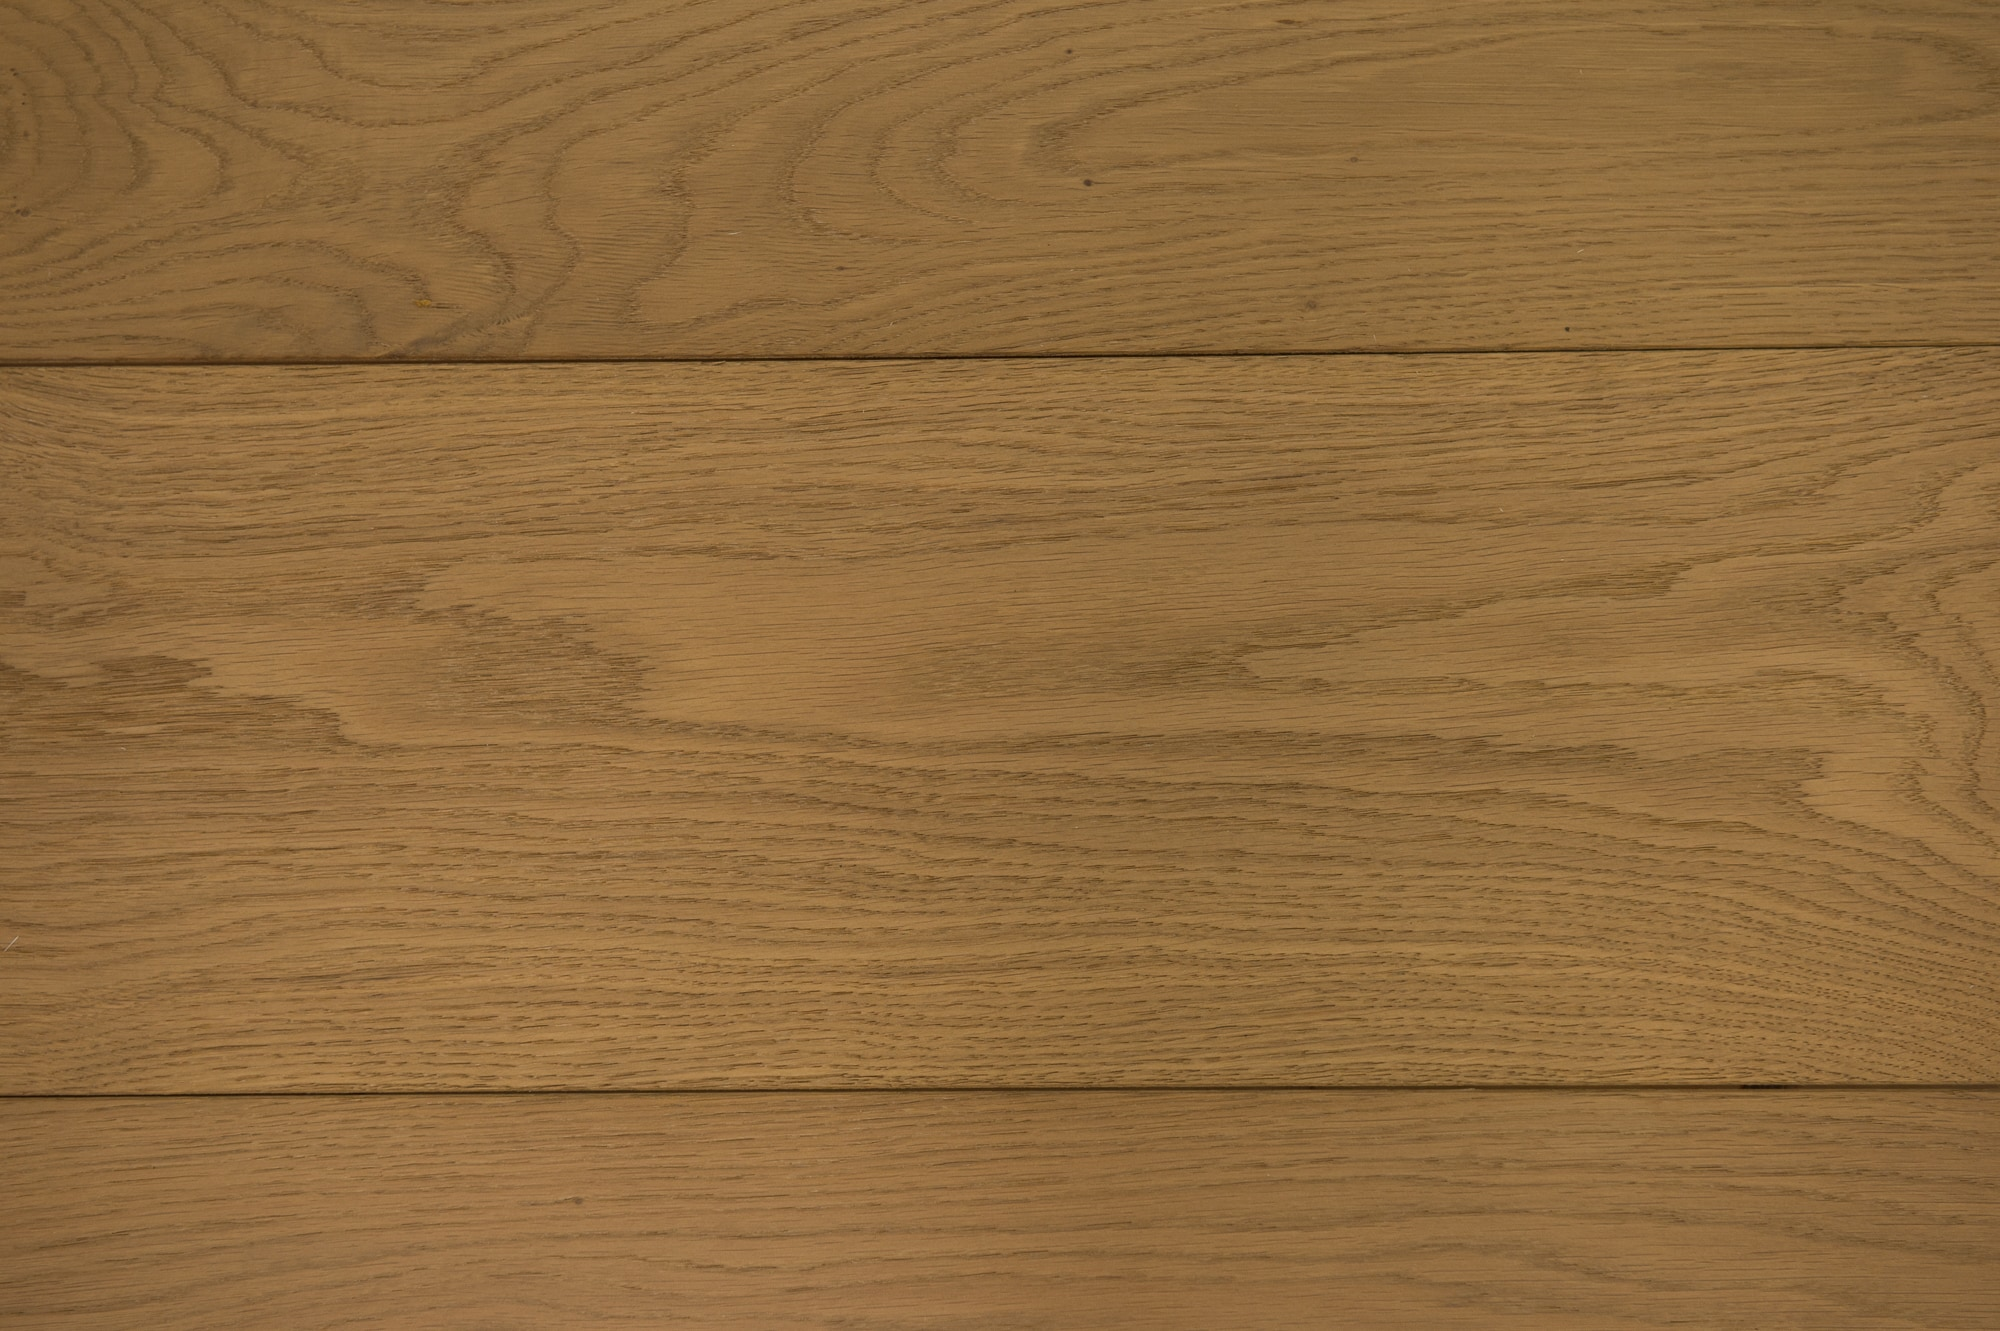 Natural / European Oak / Urethane / ABCD / Sample Engineered Hardwood - European Oak - Canyon Collection 0